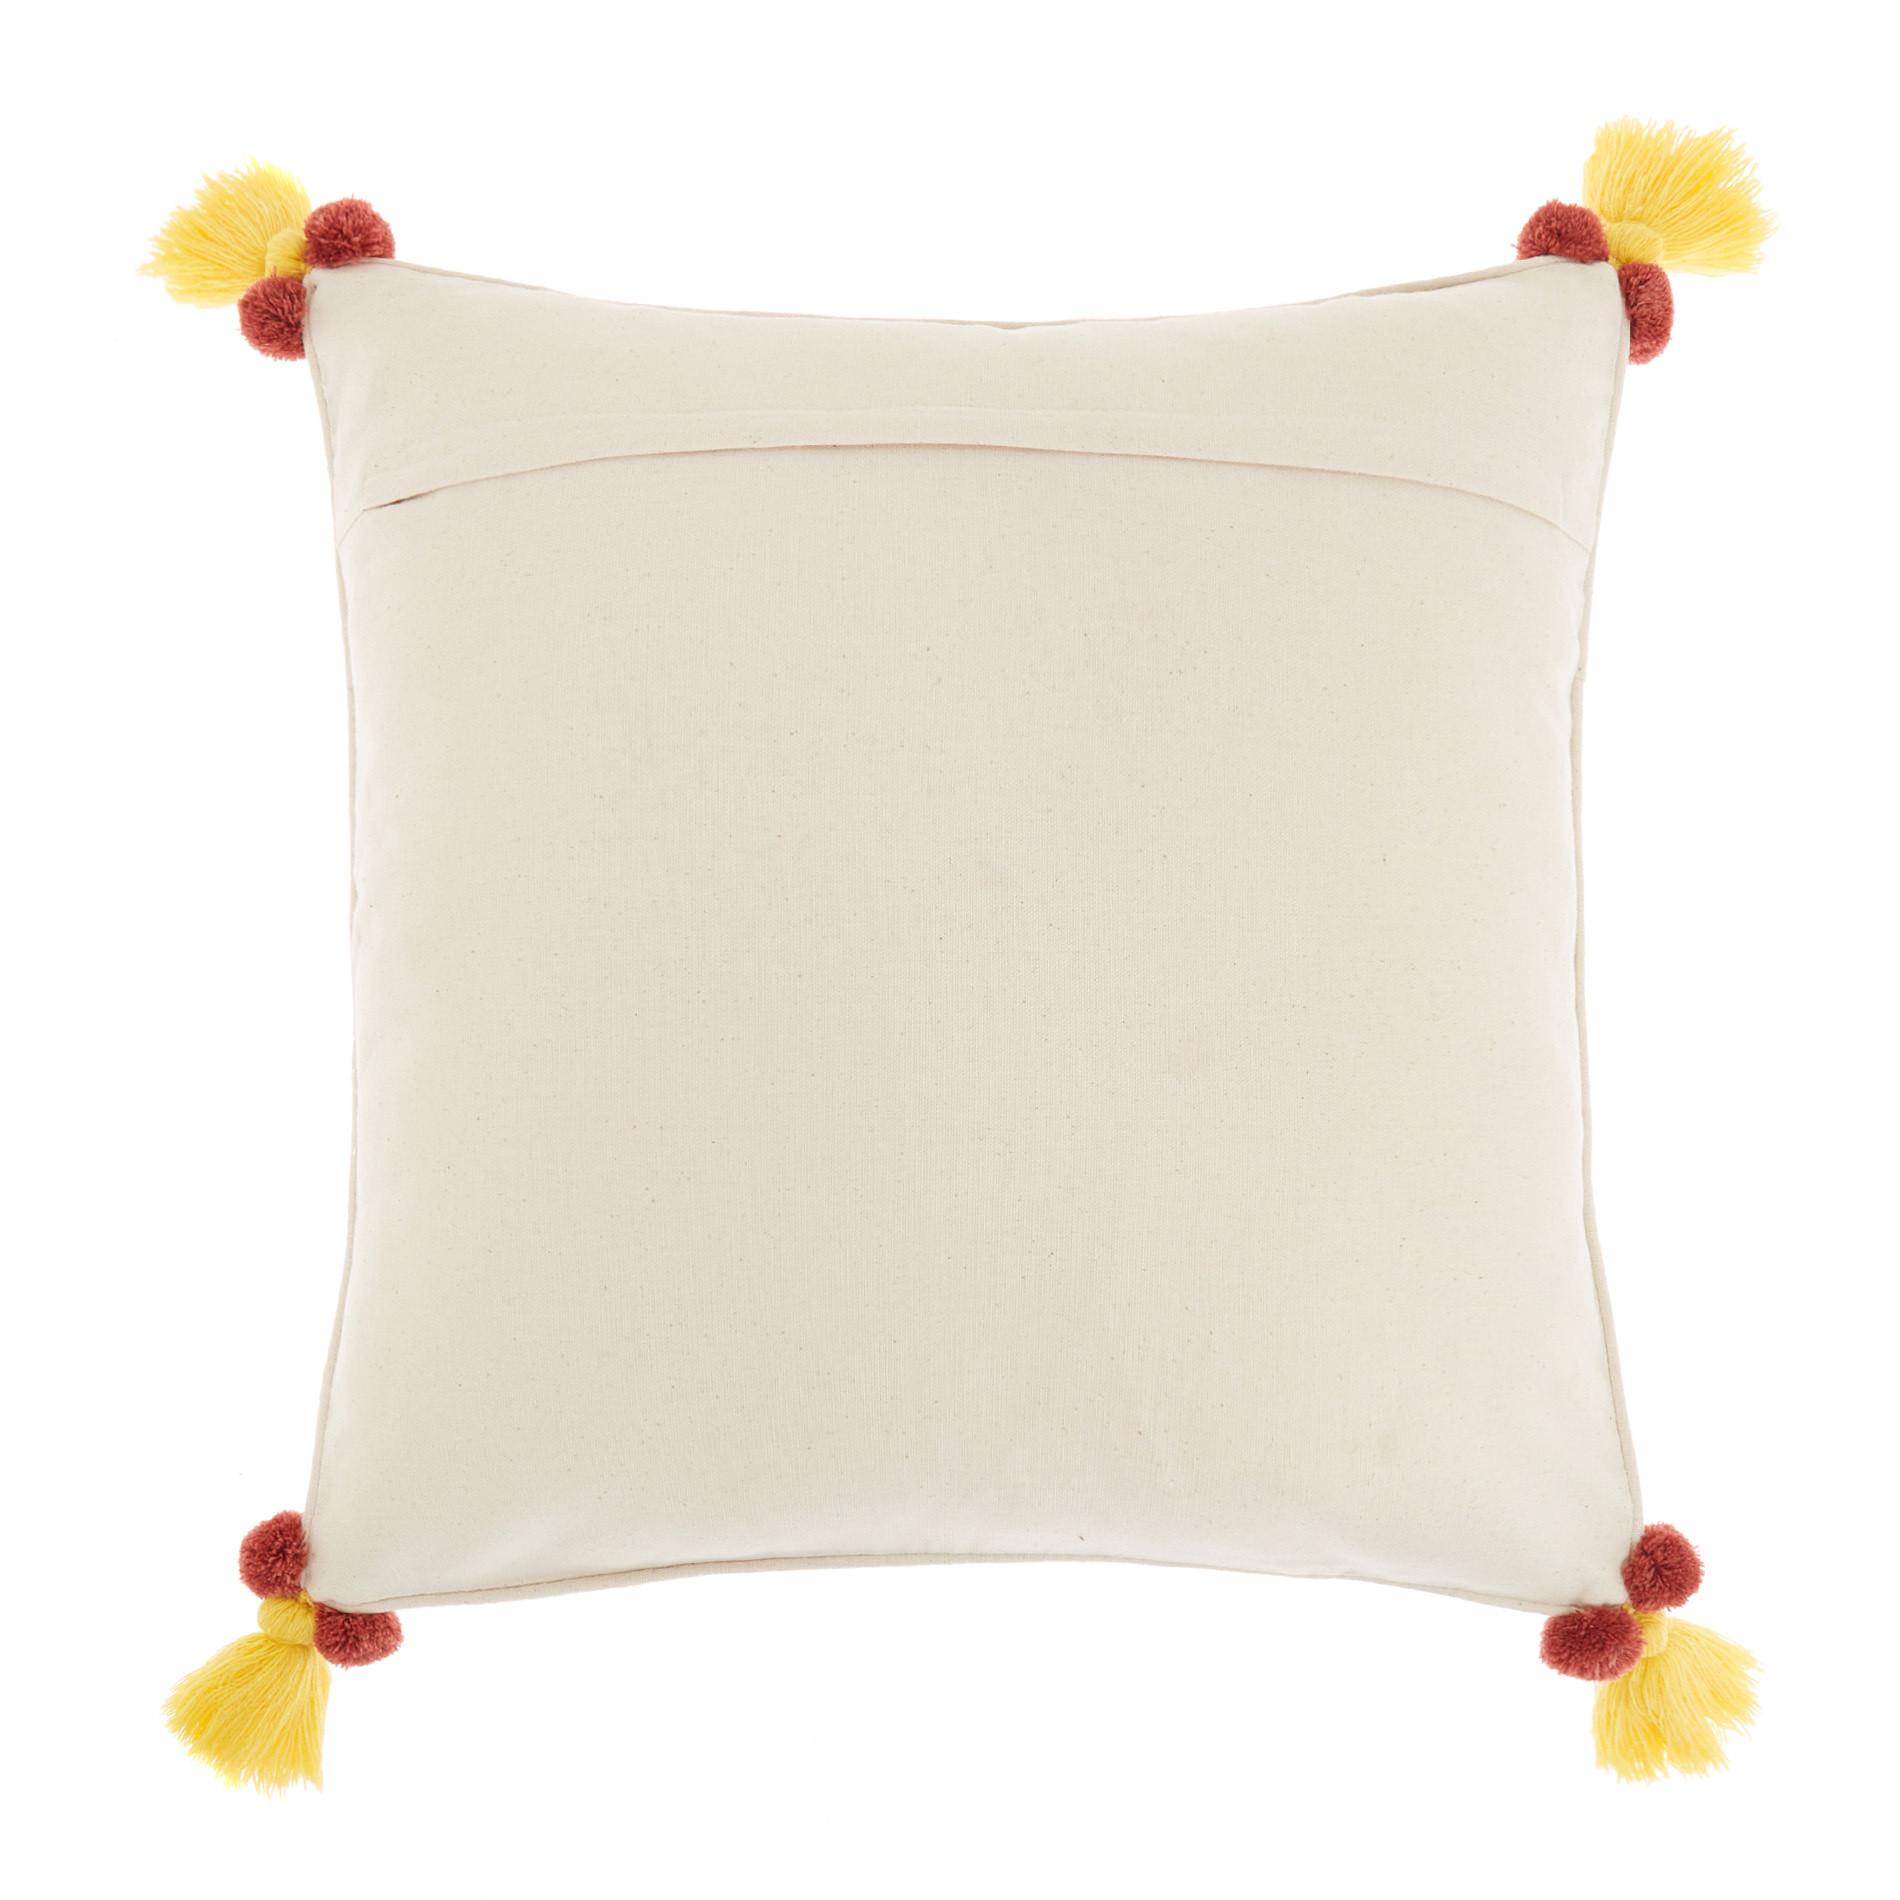 Cuscino cotone ricamo ghirlanda 45x45cm, Bianco, large image number 1